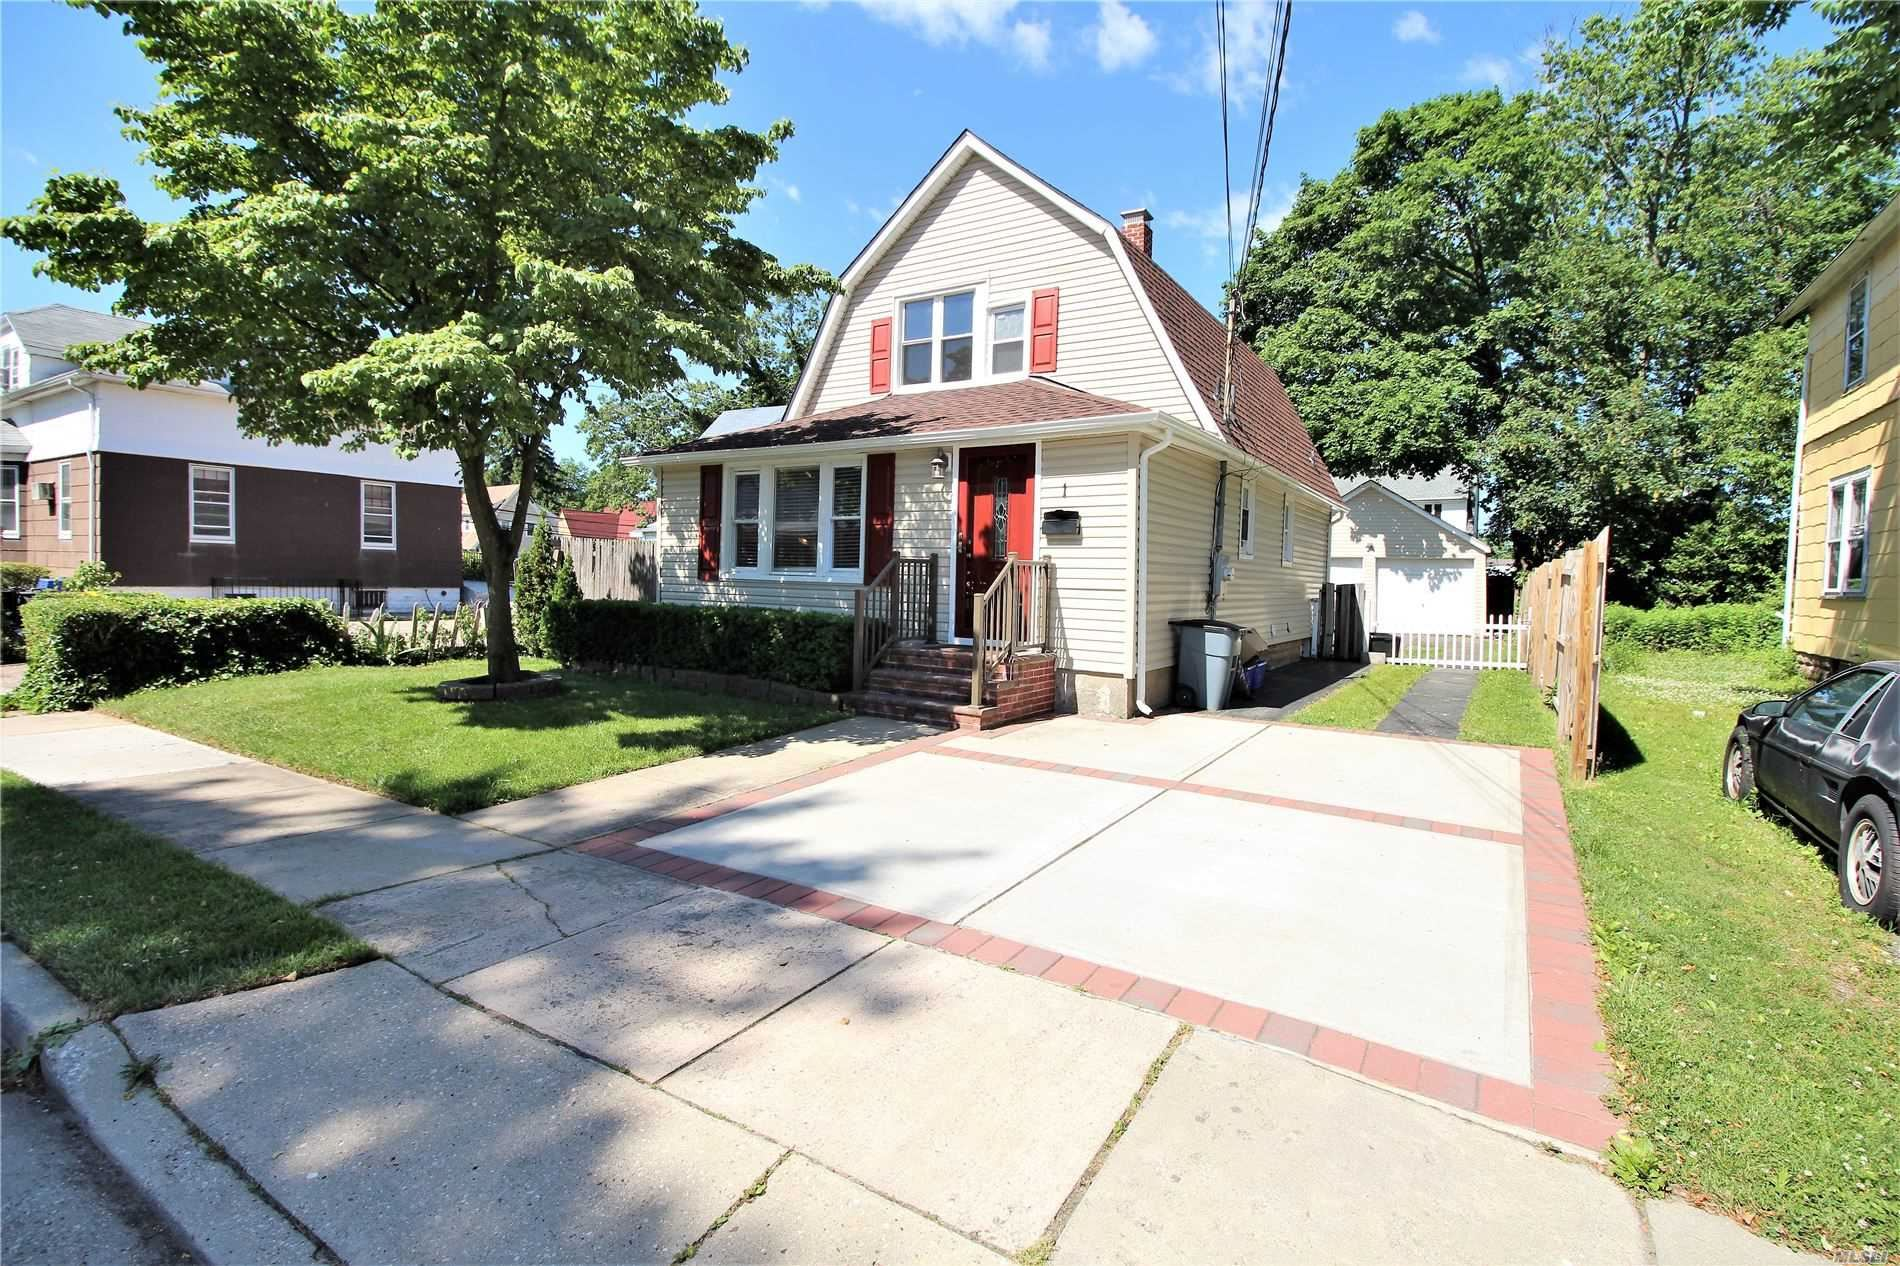 1 Fargo Street, Baldwin, NY 11510 - MLS#: 3222176